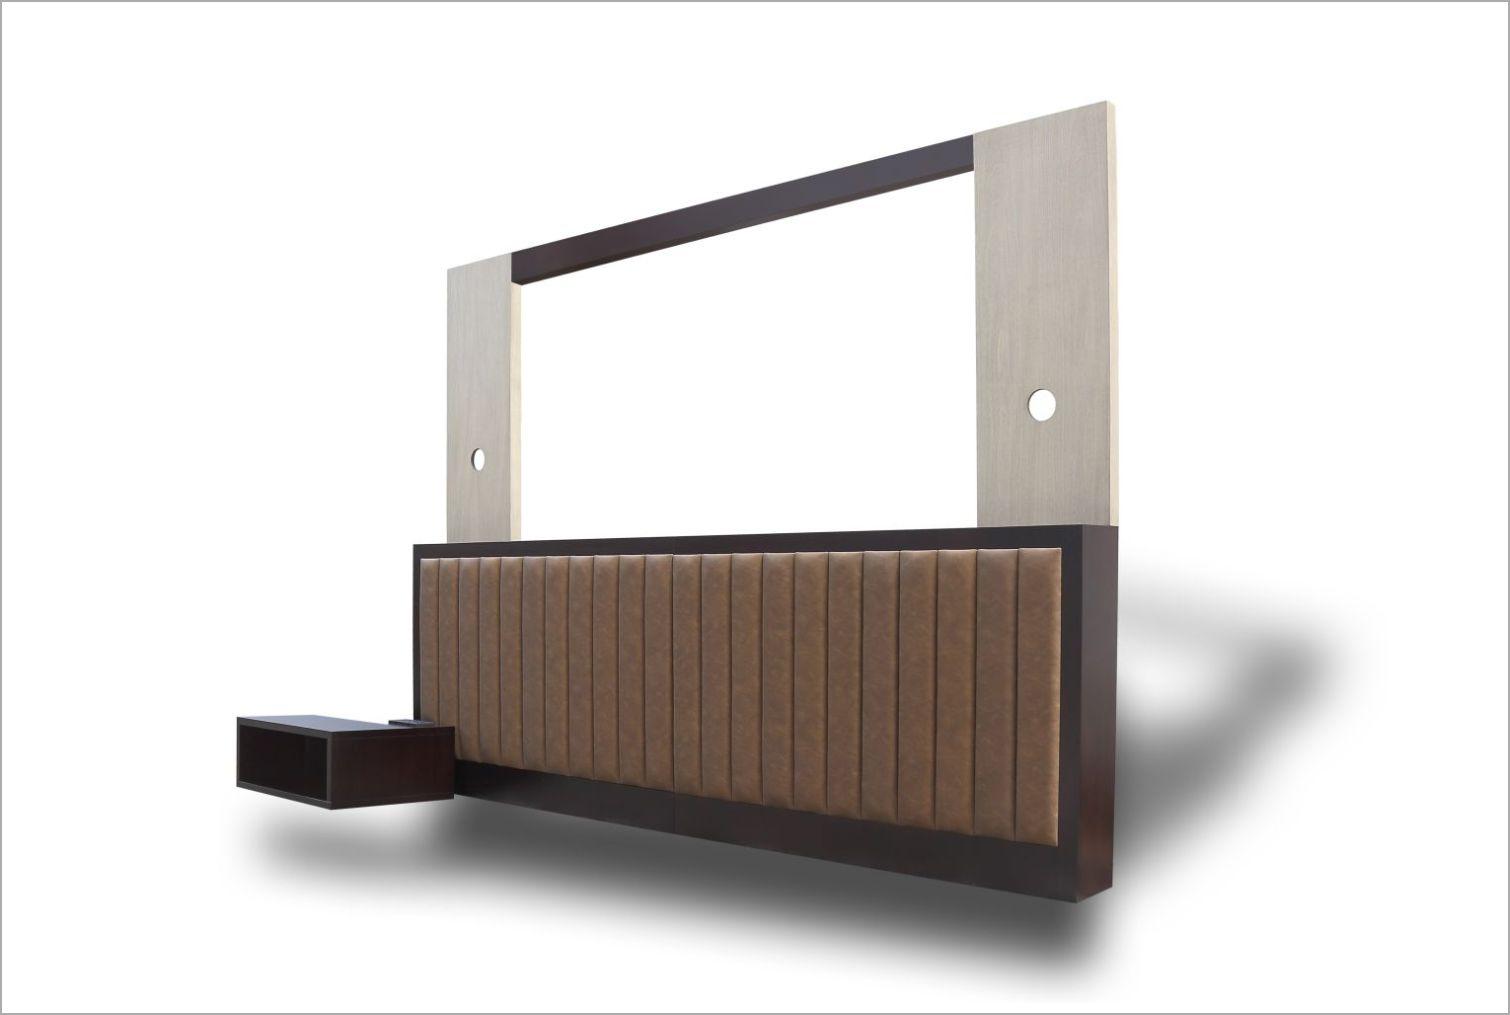 Modular Hotel Headboard with Nightstand